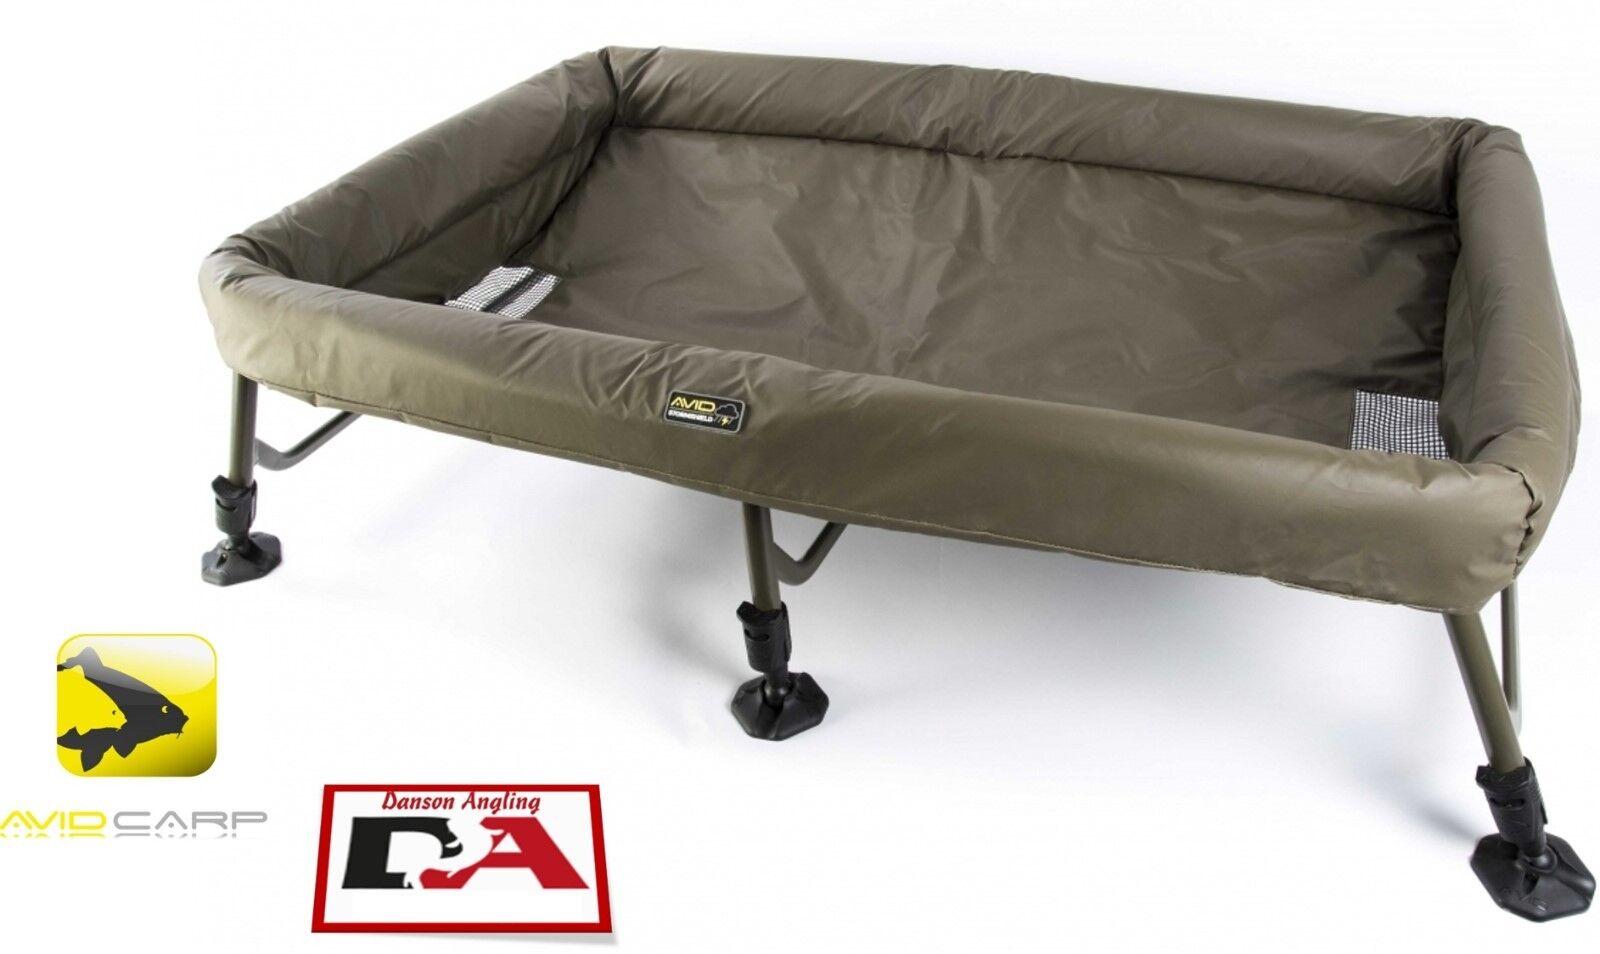 Avid Stormshield Safeguard XL Carp Cradle New New Avid Unhooking Mats